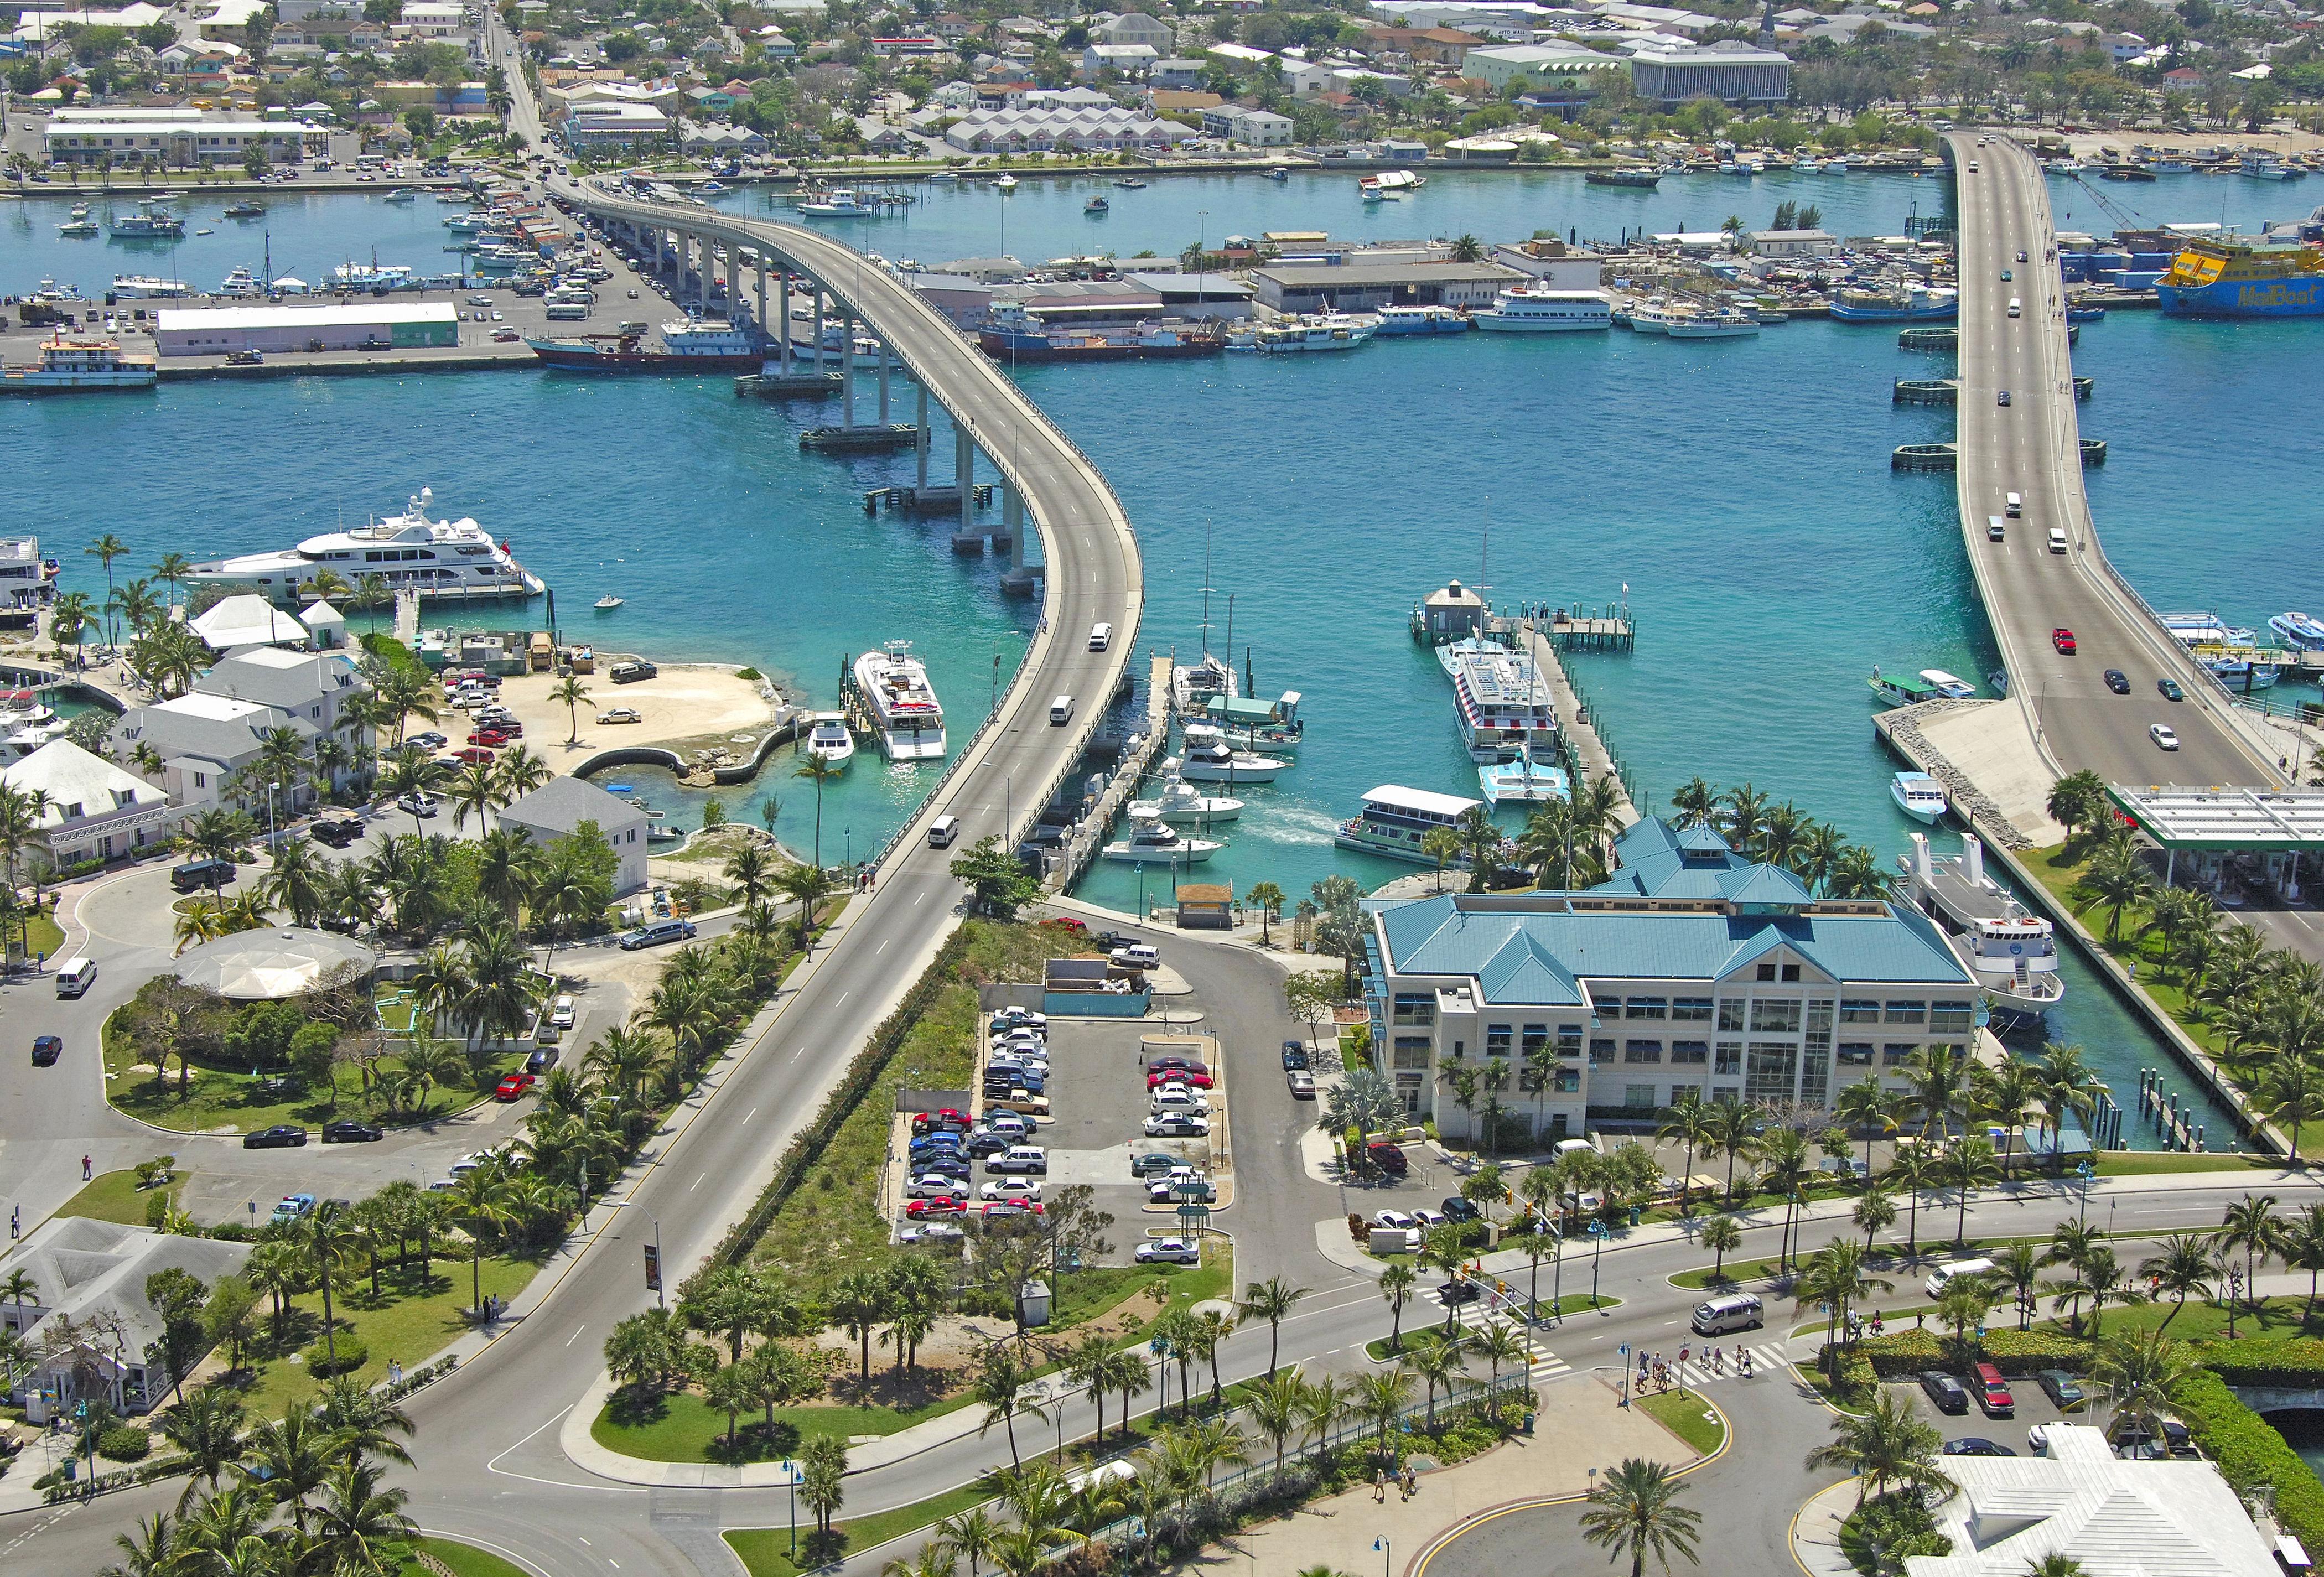 Paradise Island Charter Dock In Paradise Island, Bahamas